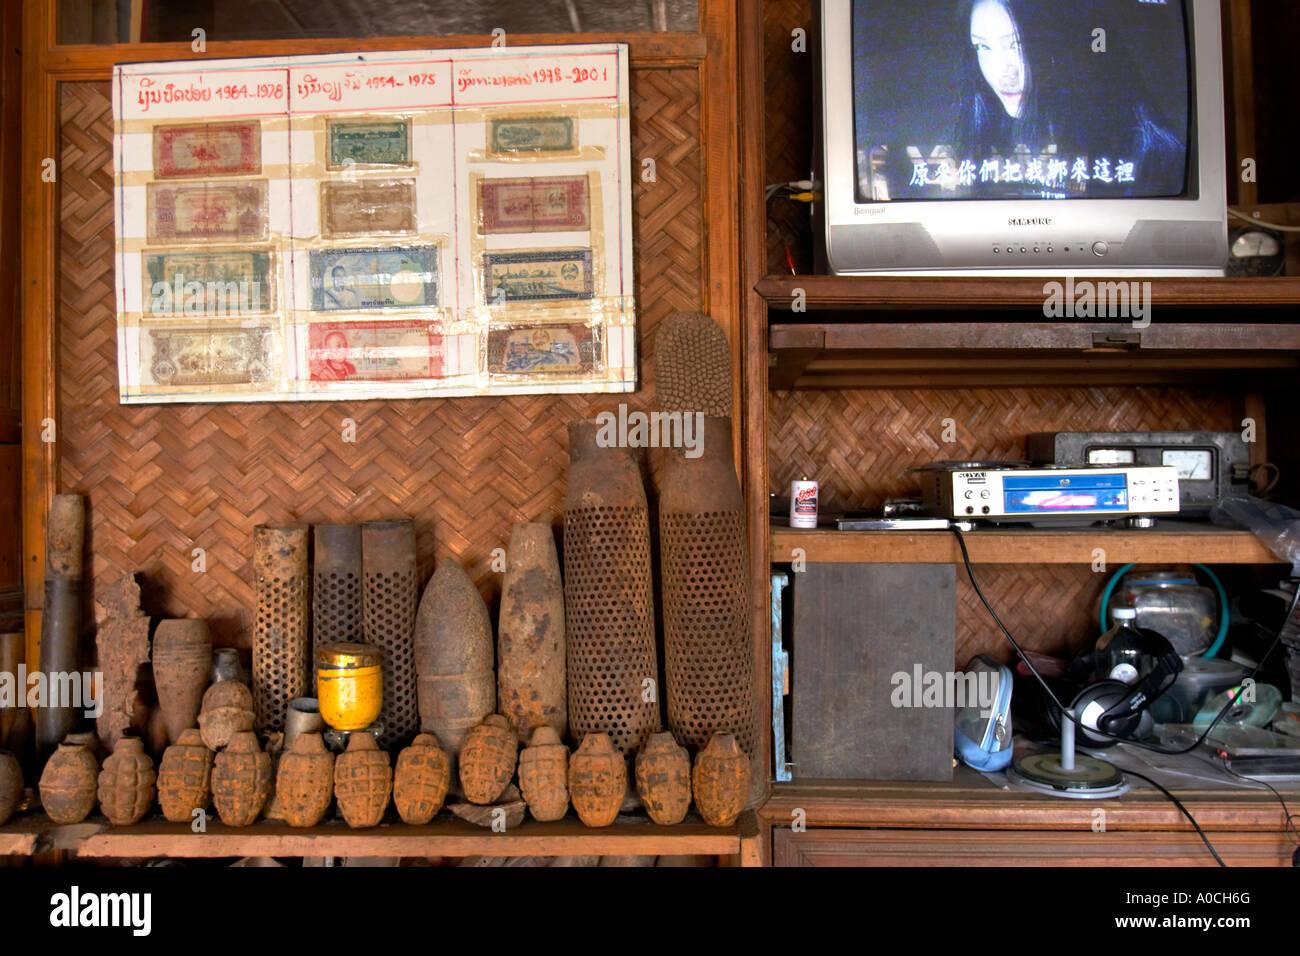 War scrap in a guesthouse, Phonsavan, Laos - Stock Image